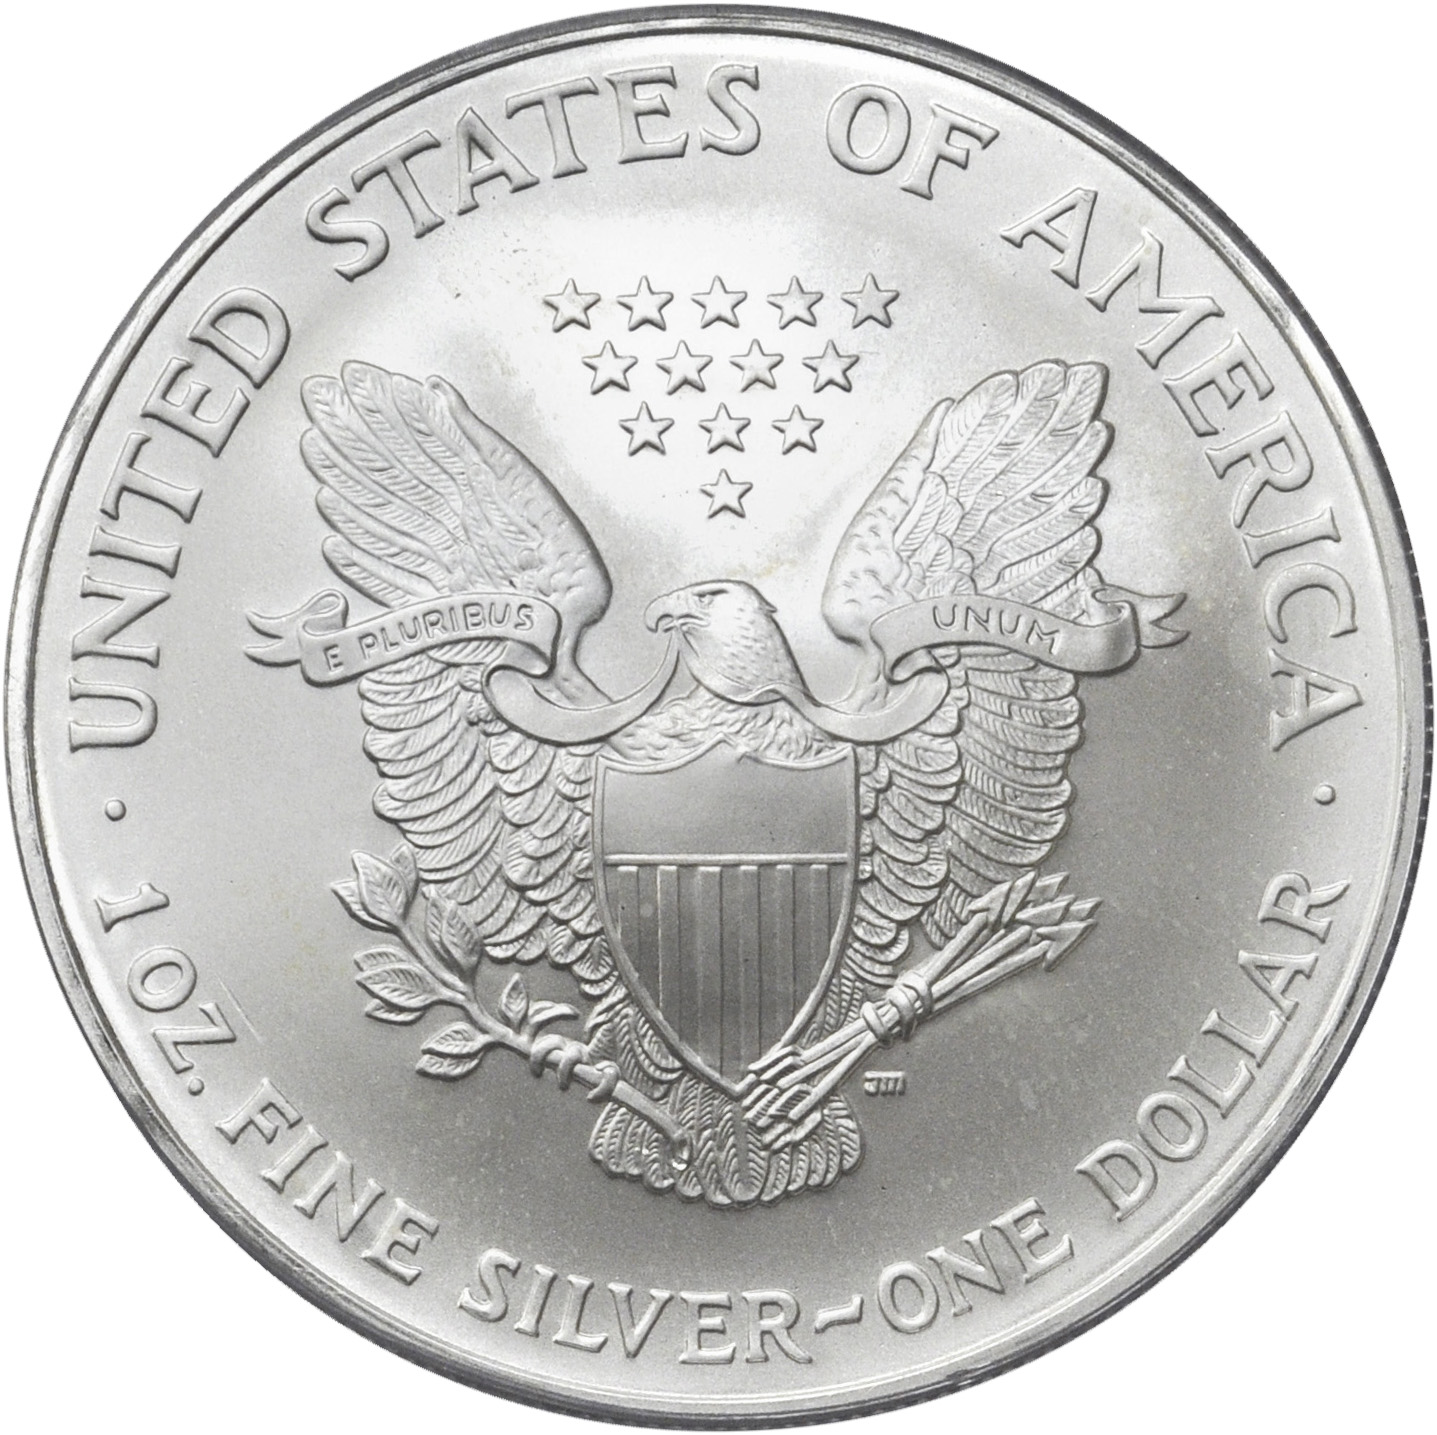 Value Of 2006 1 Silver Coin American Silver Eagle Coin